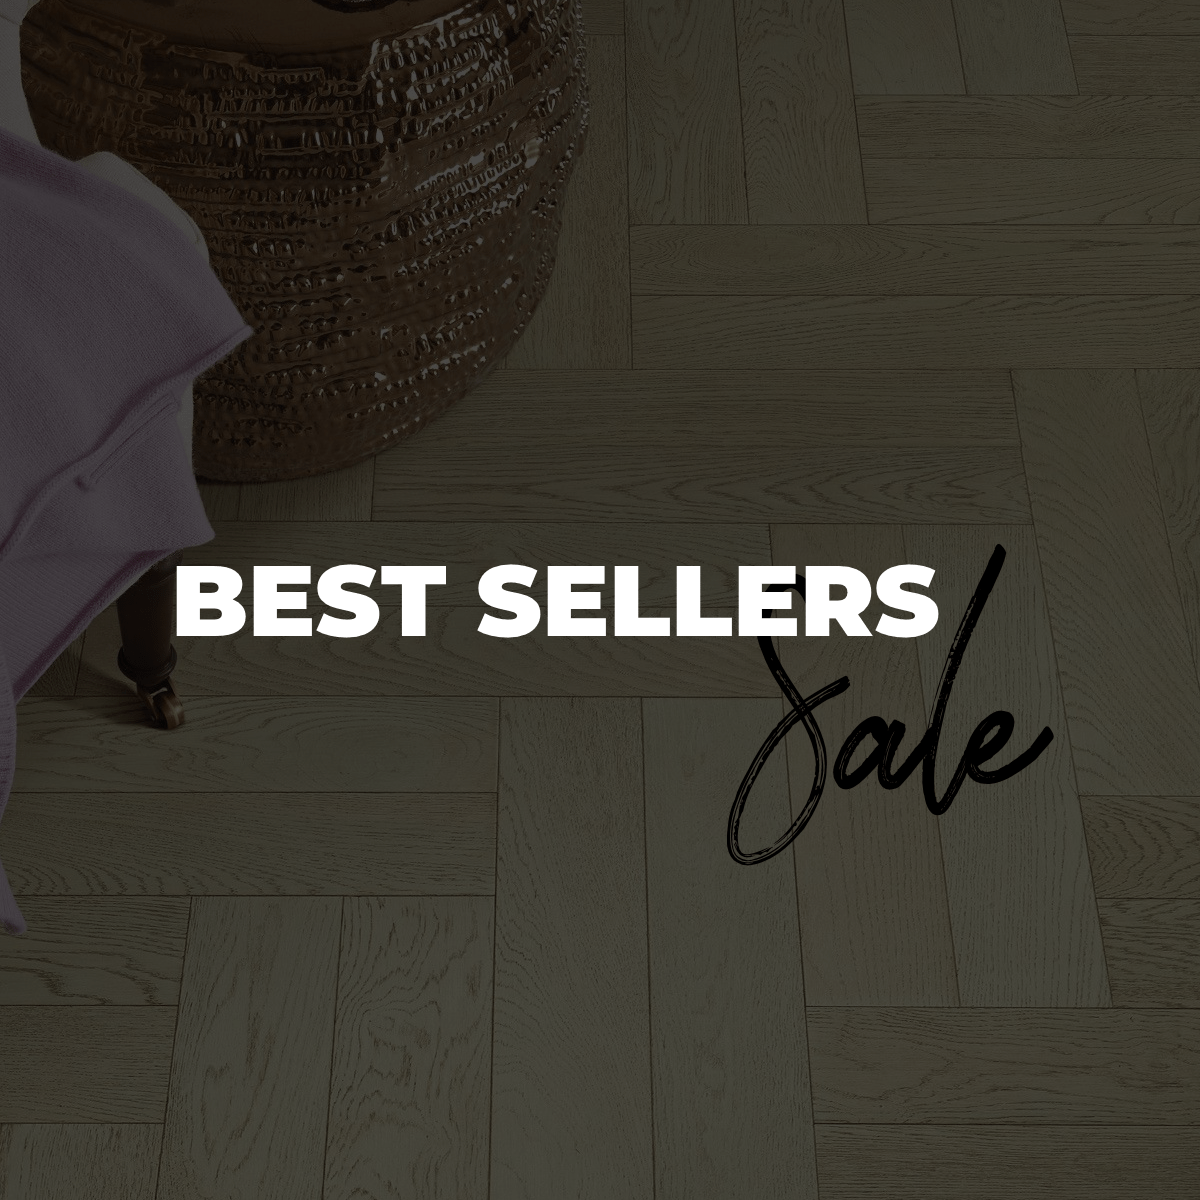 Roberts sale | Roberts Carpet & Fine Floors